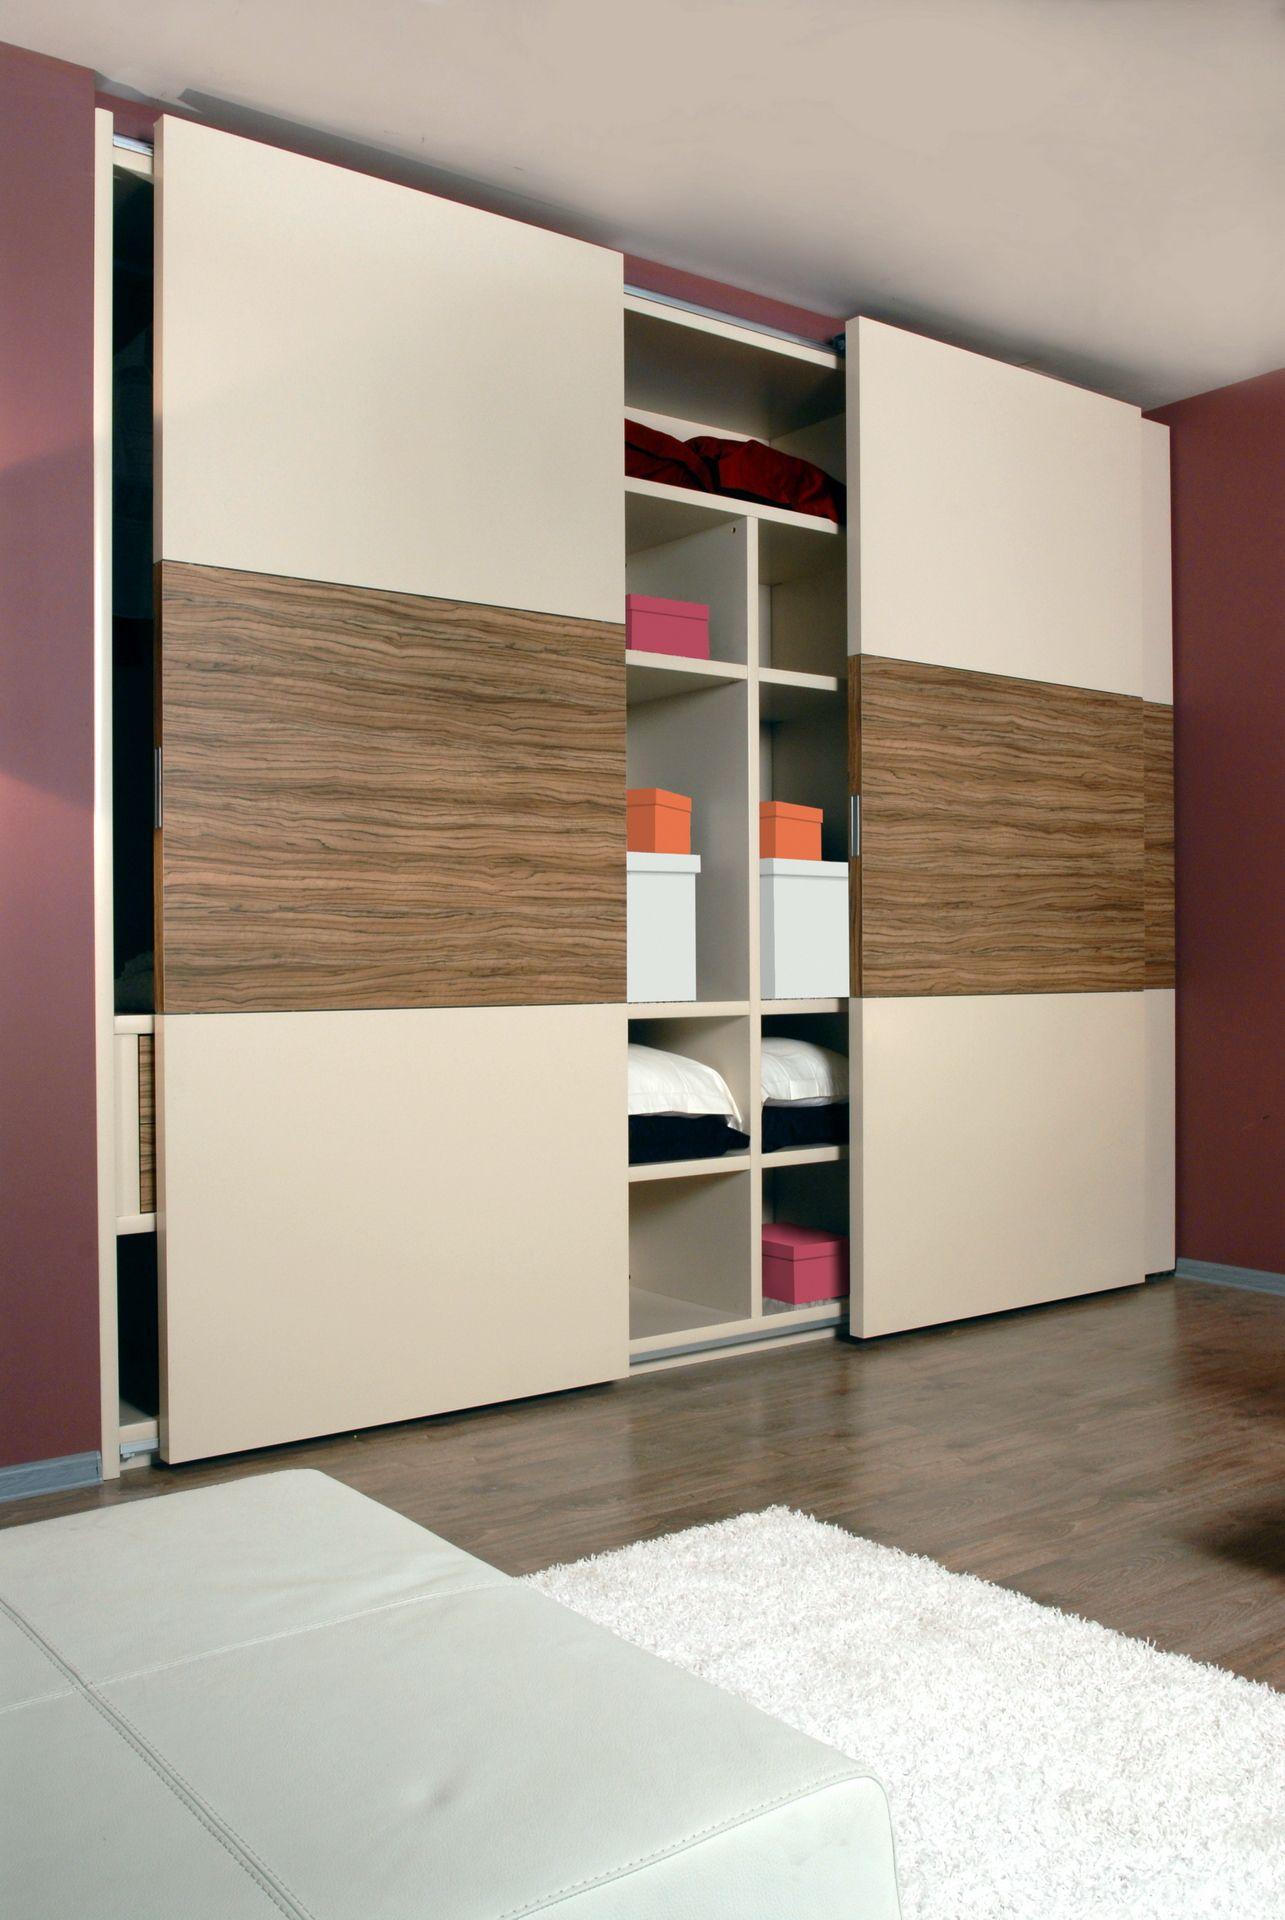 Bespoke Bedroom Furniture Paolomarchetti Furniture Design